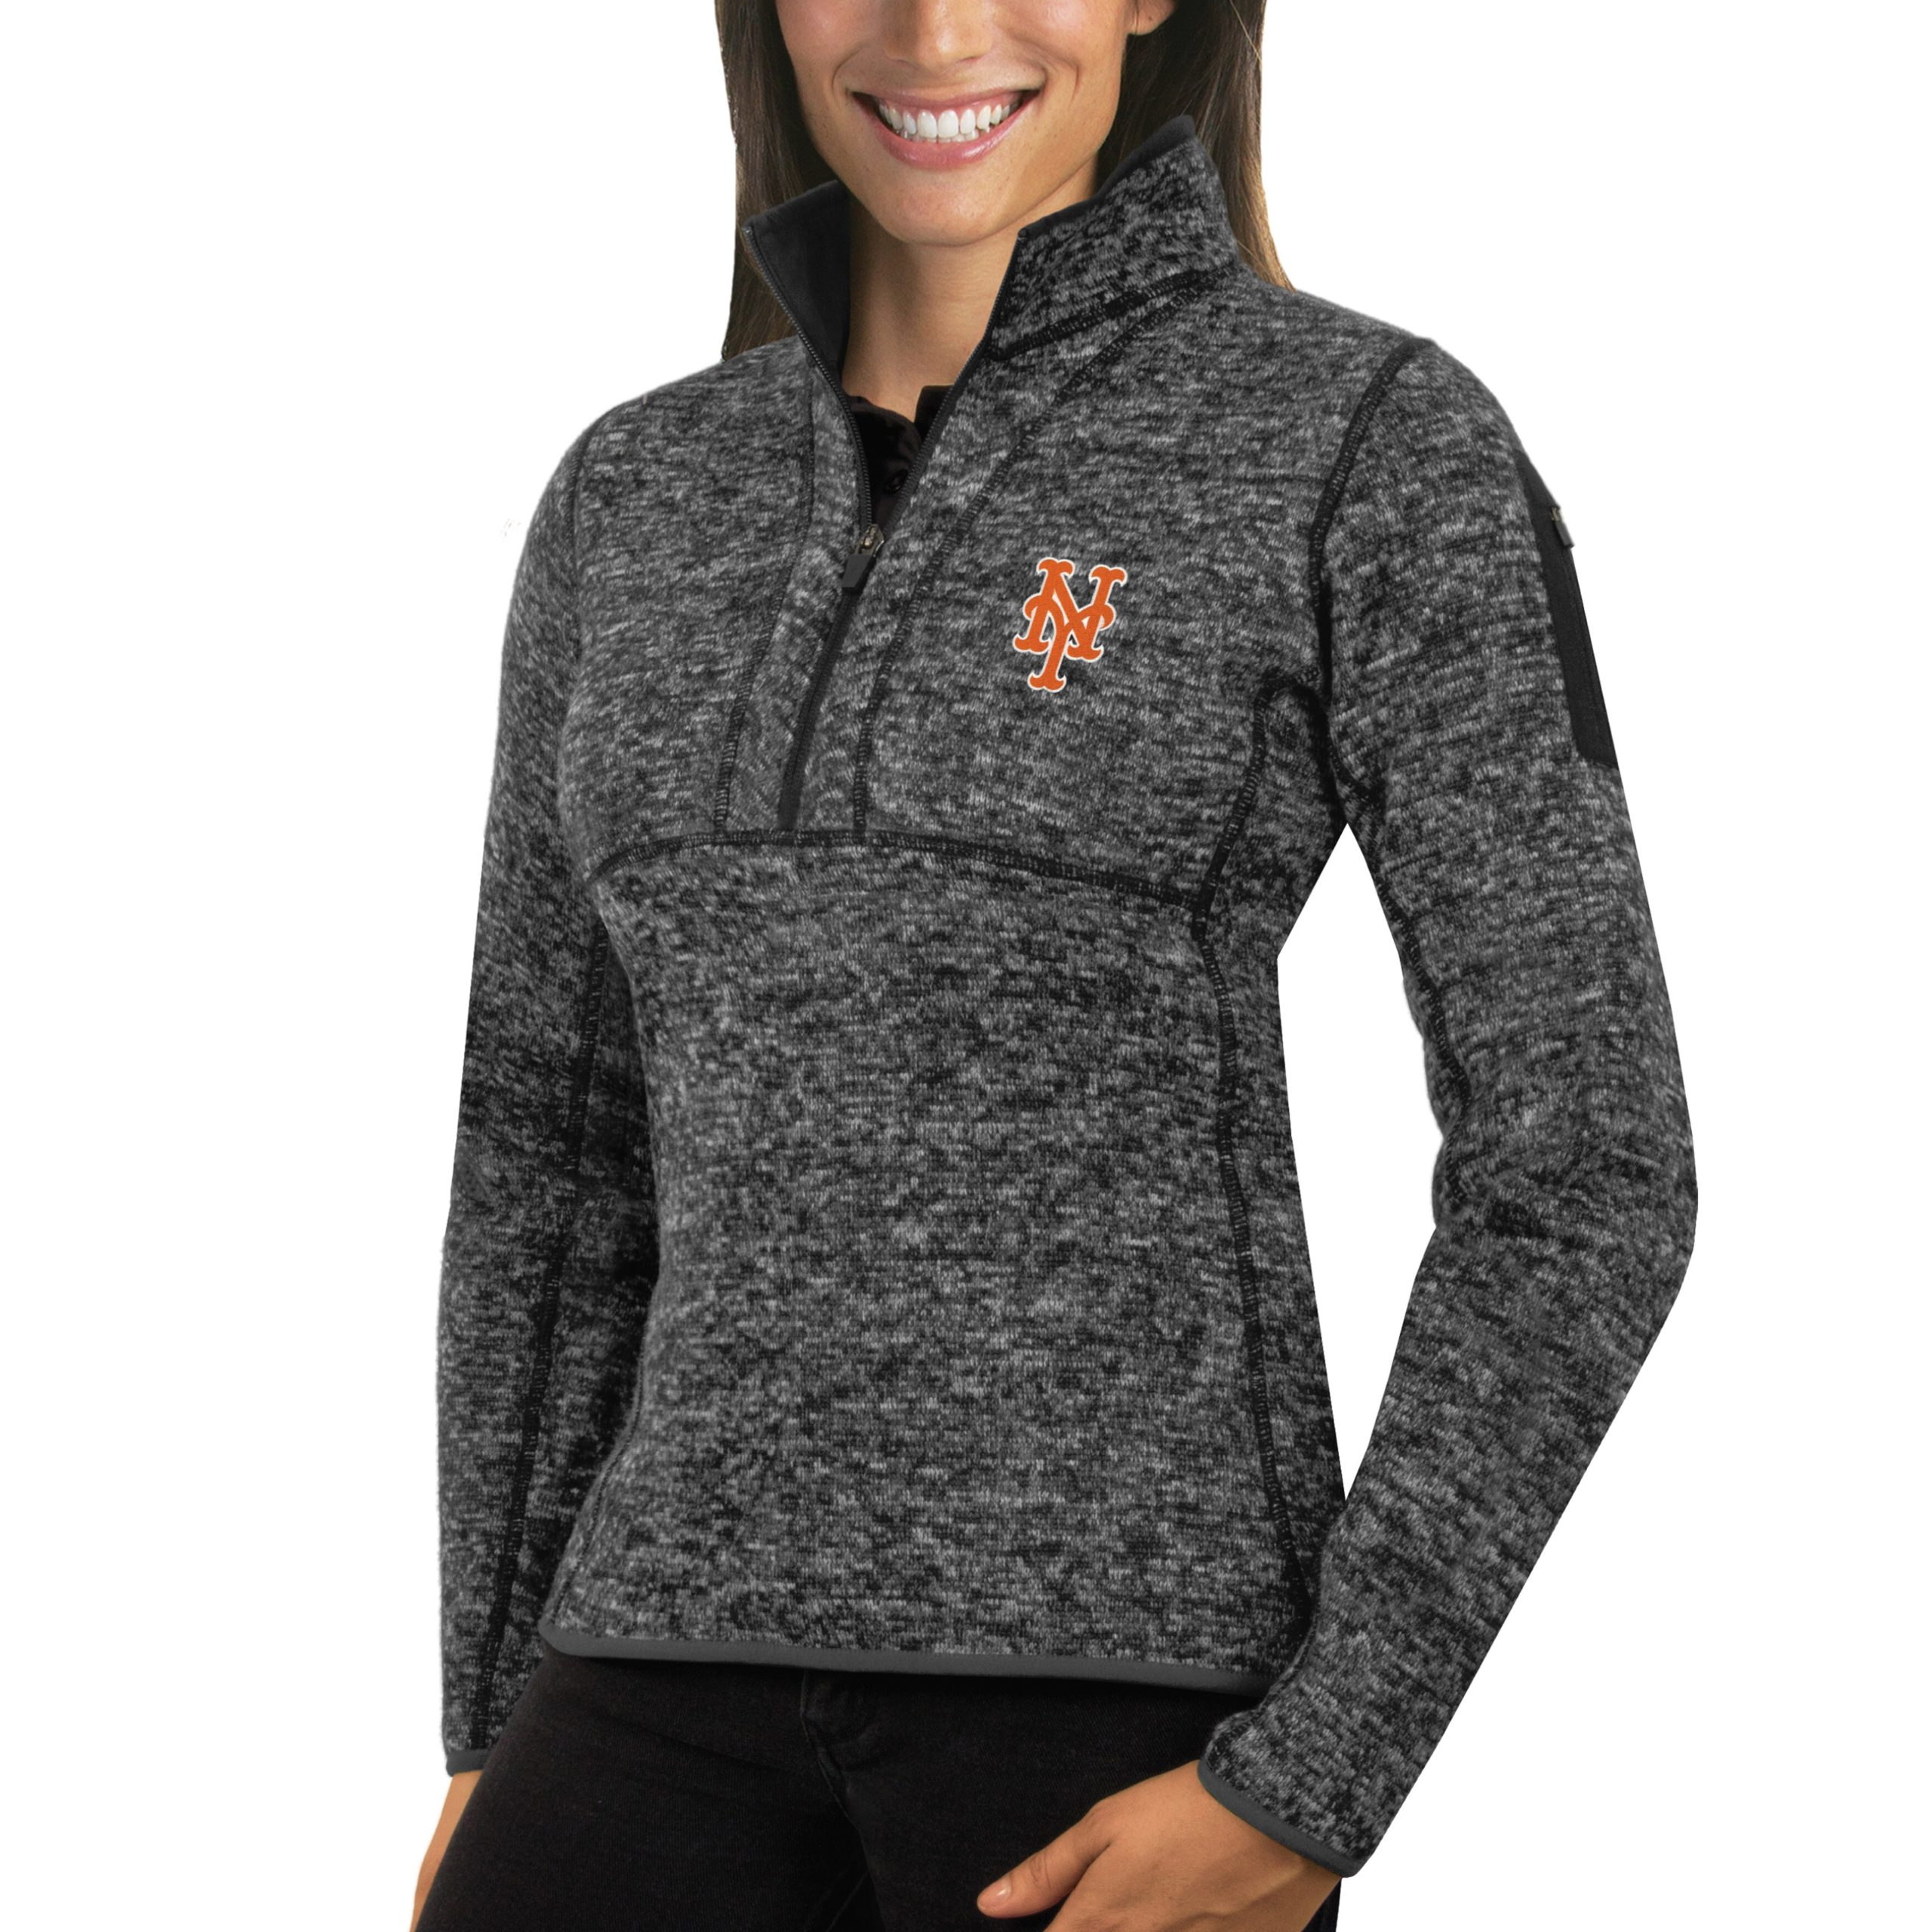 New York Mets Antigua Women's Fortune Half-Zip Pullover Sweater - Heathered Charcoal